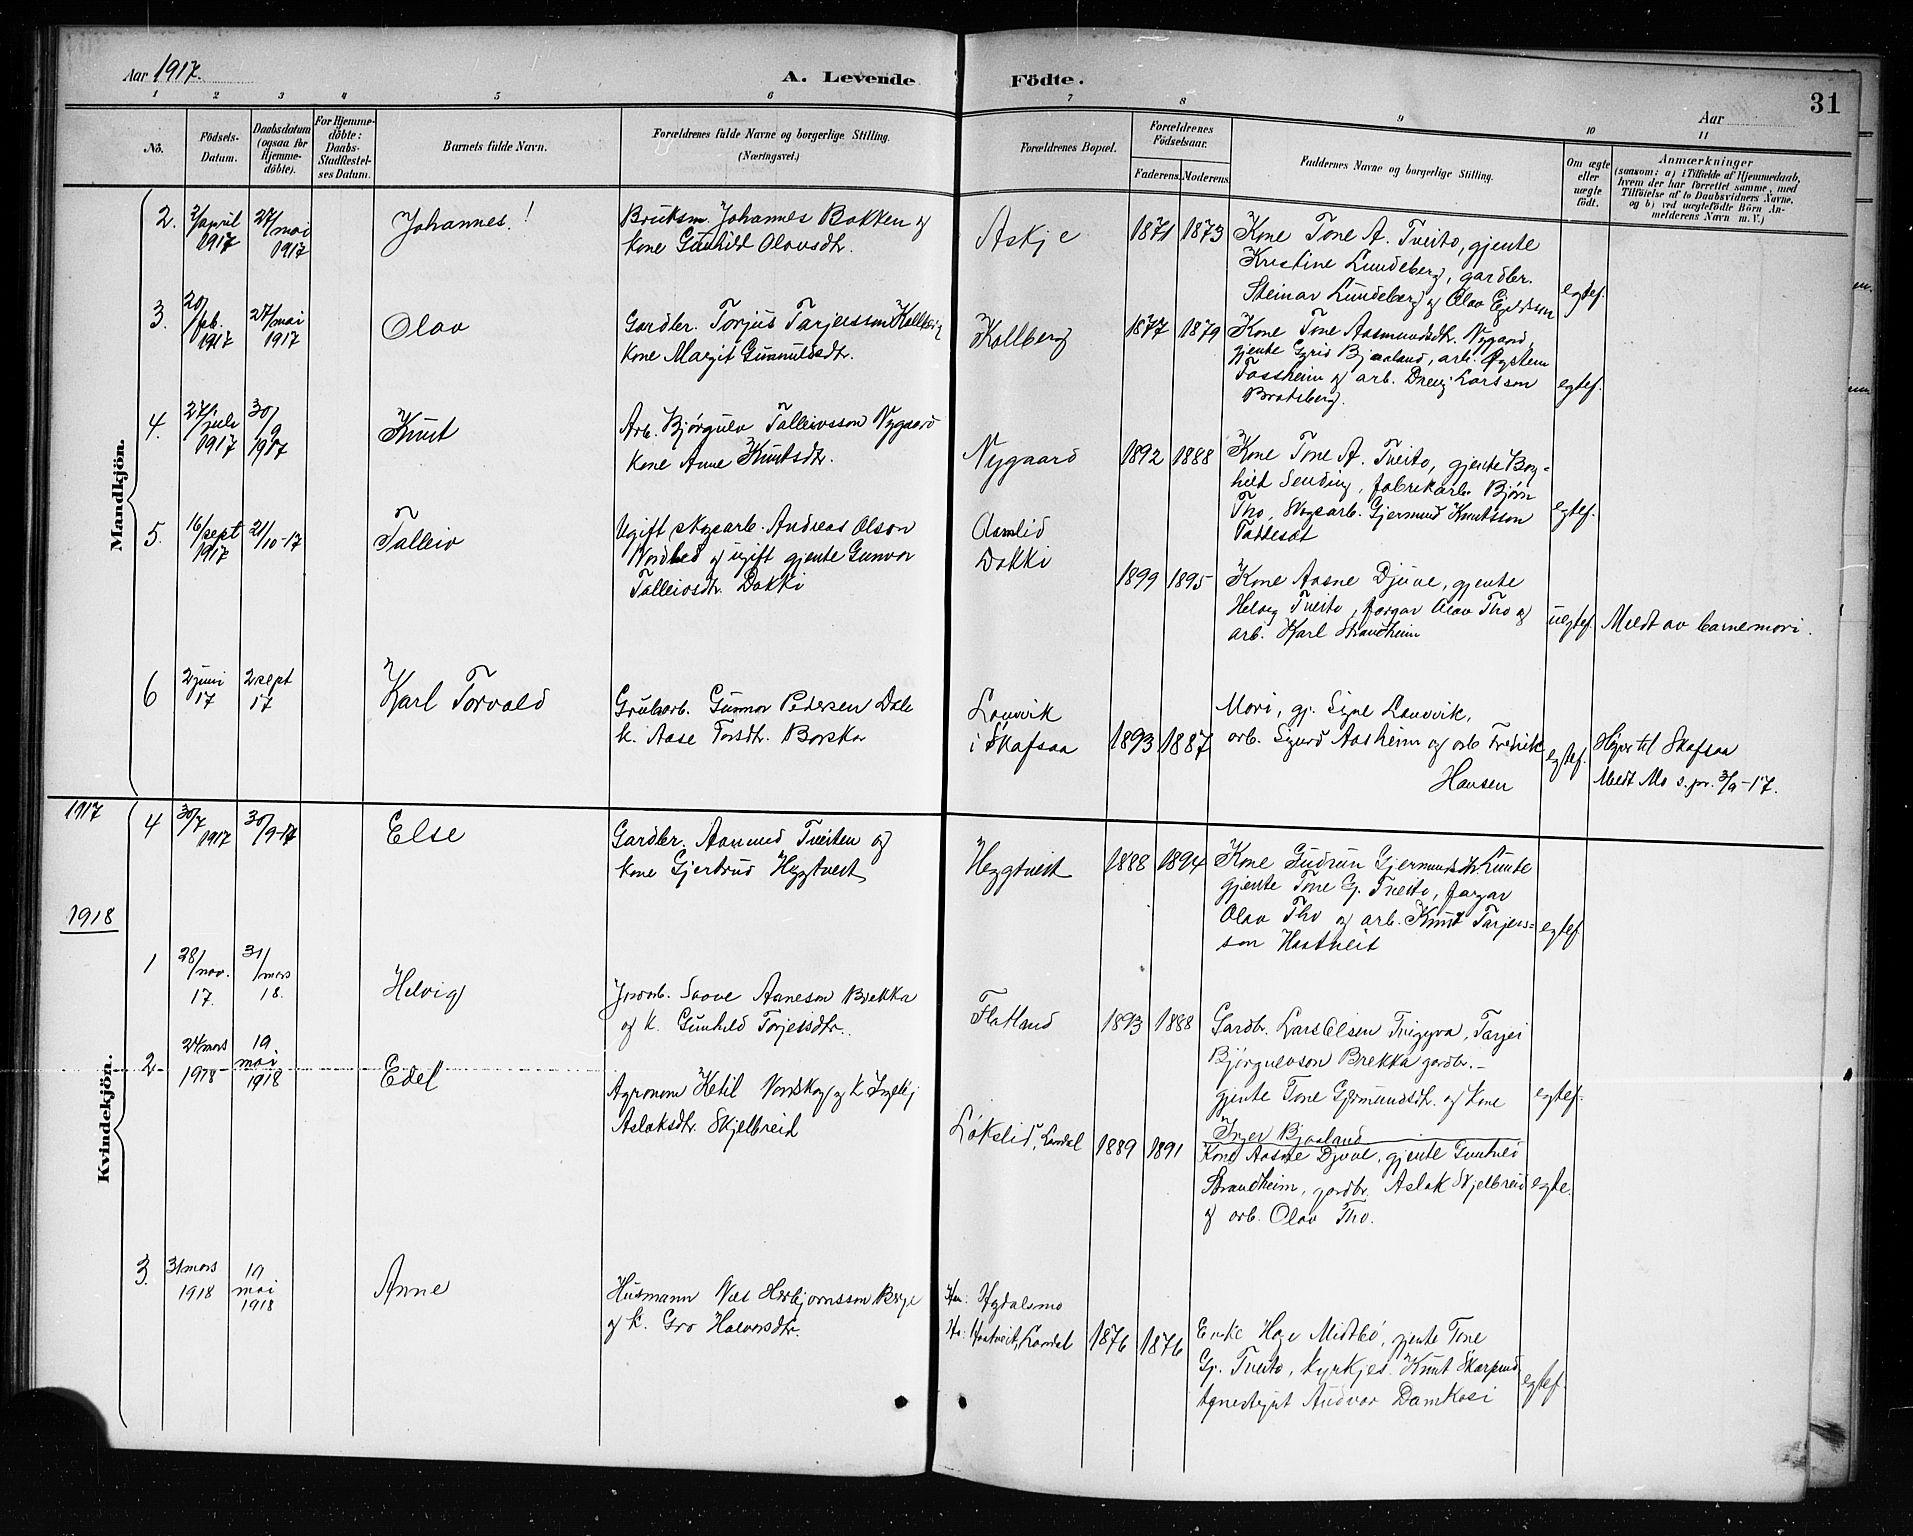 SAKO, Lårdal kirkebøker, G/Ga/L0003: Klokkerbok nr. I 3, 1891-1918, s. 31